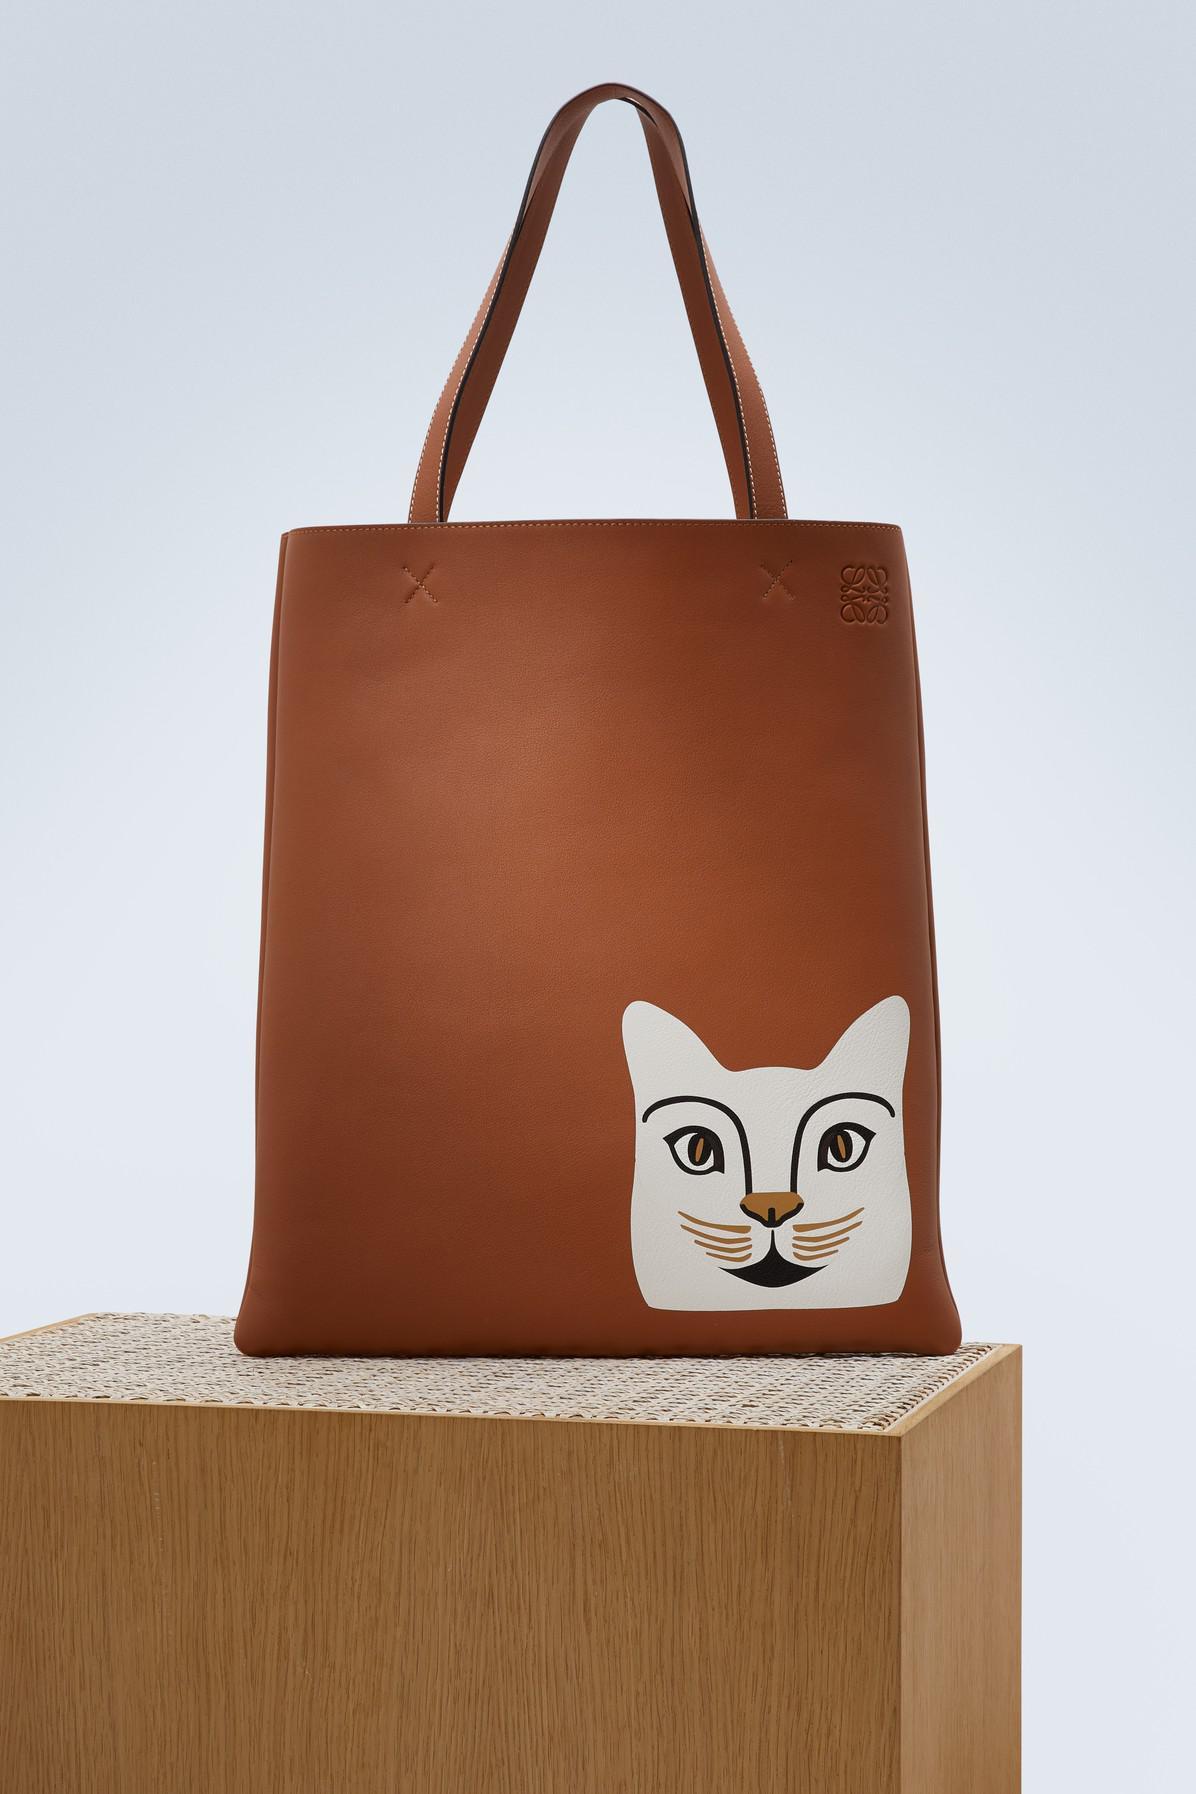 Loewe Sac Cabas Vertical Cat en Cuir de Veau Tan et Blanc uuBaDlx